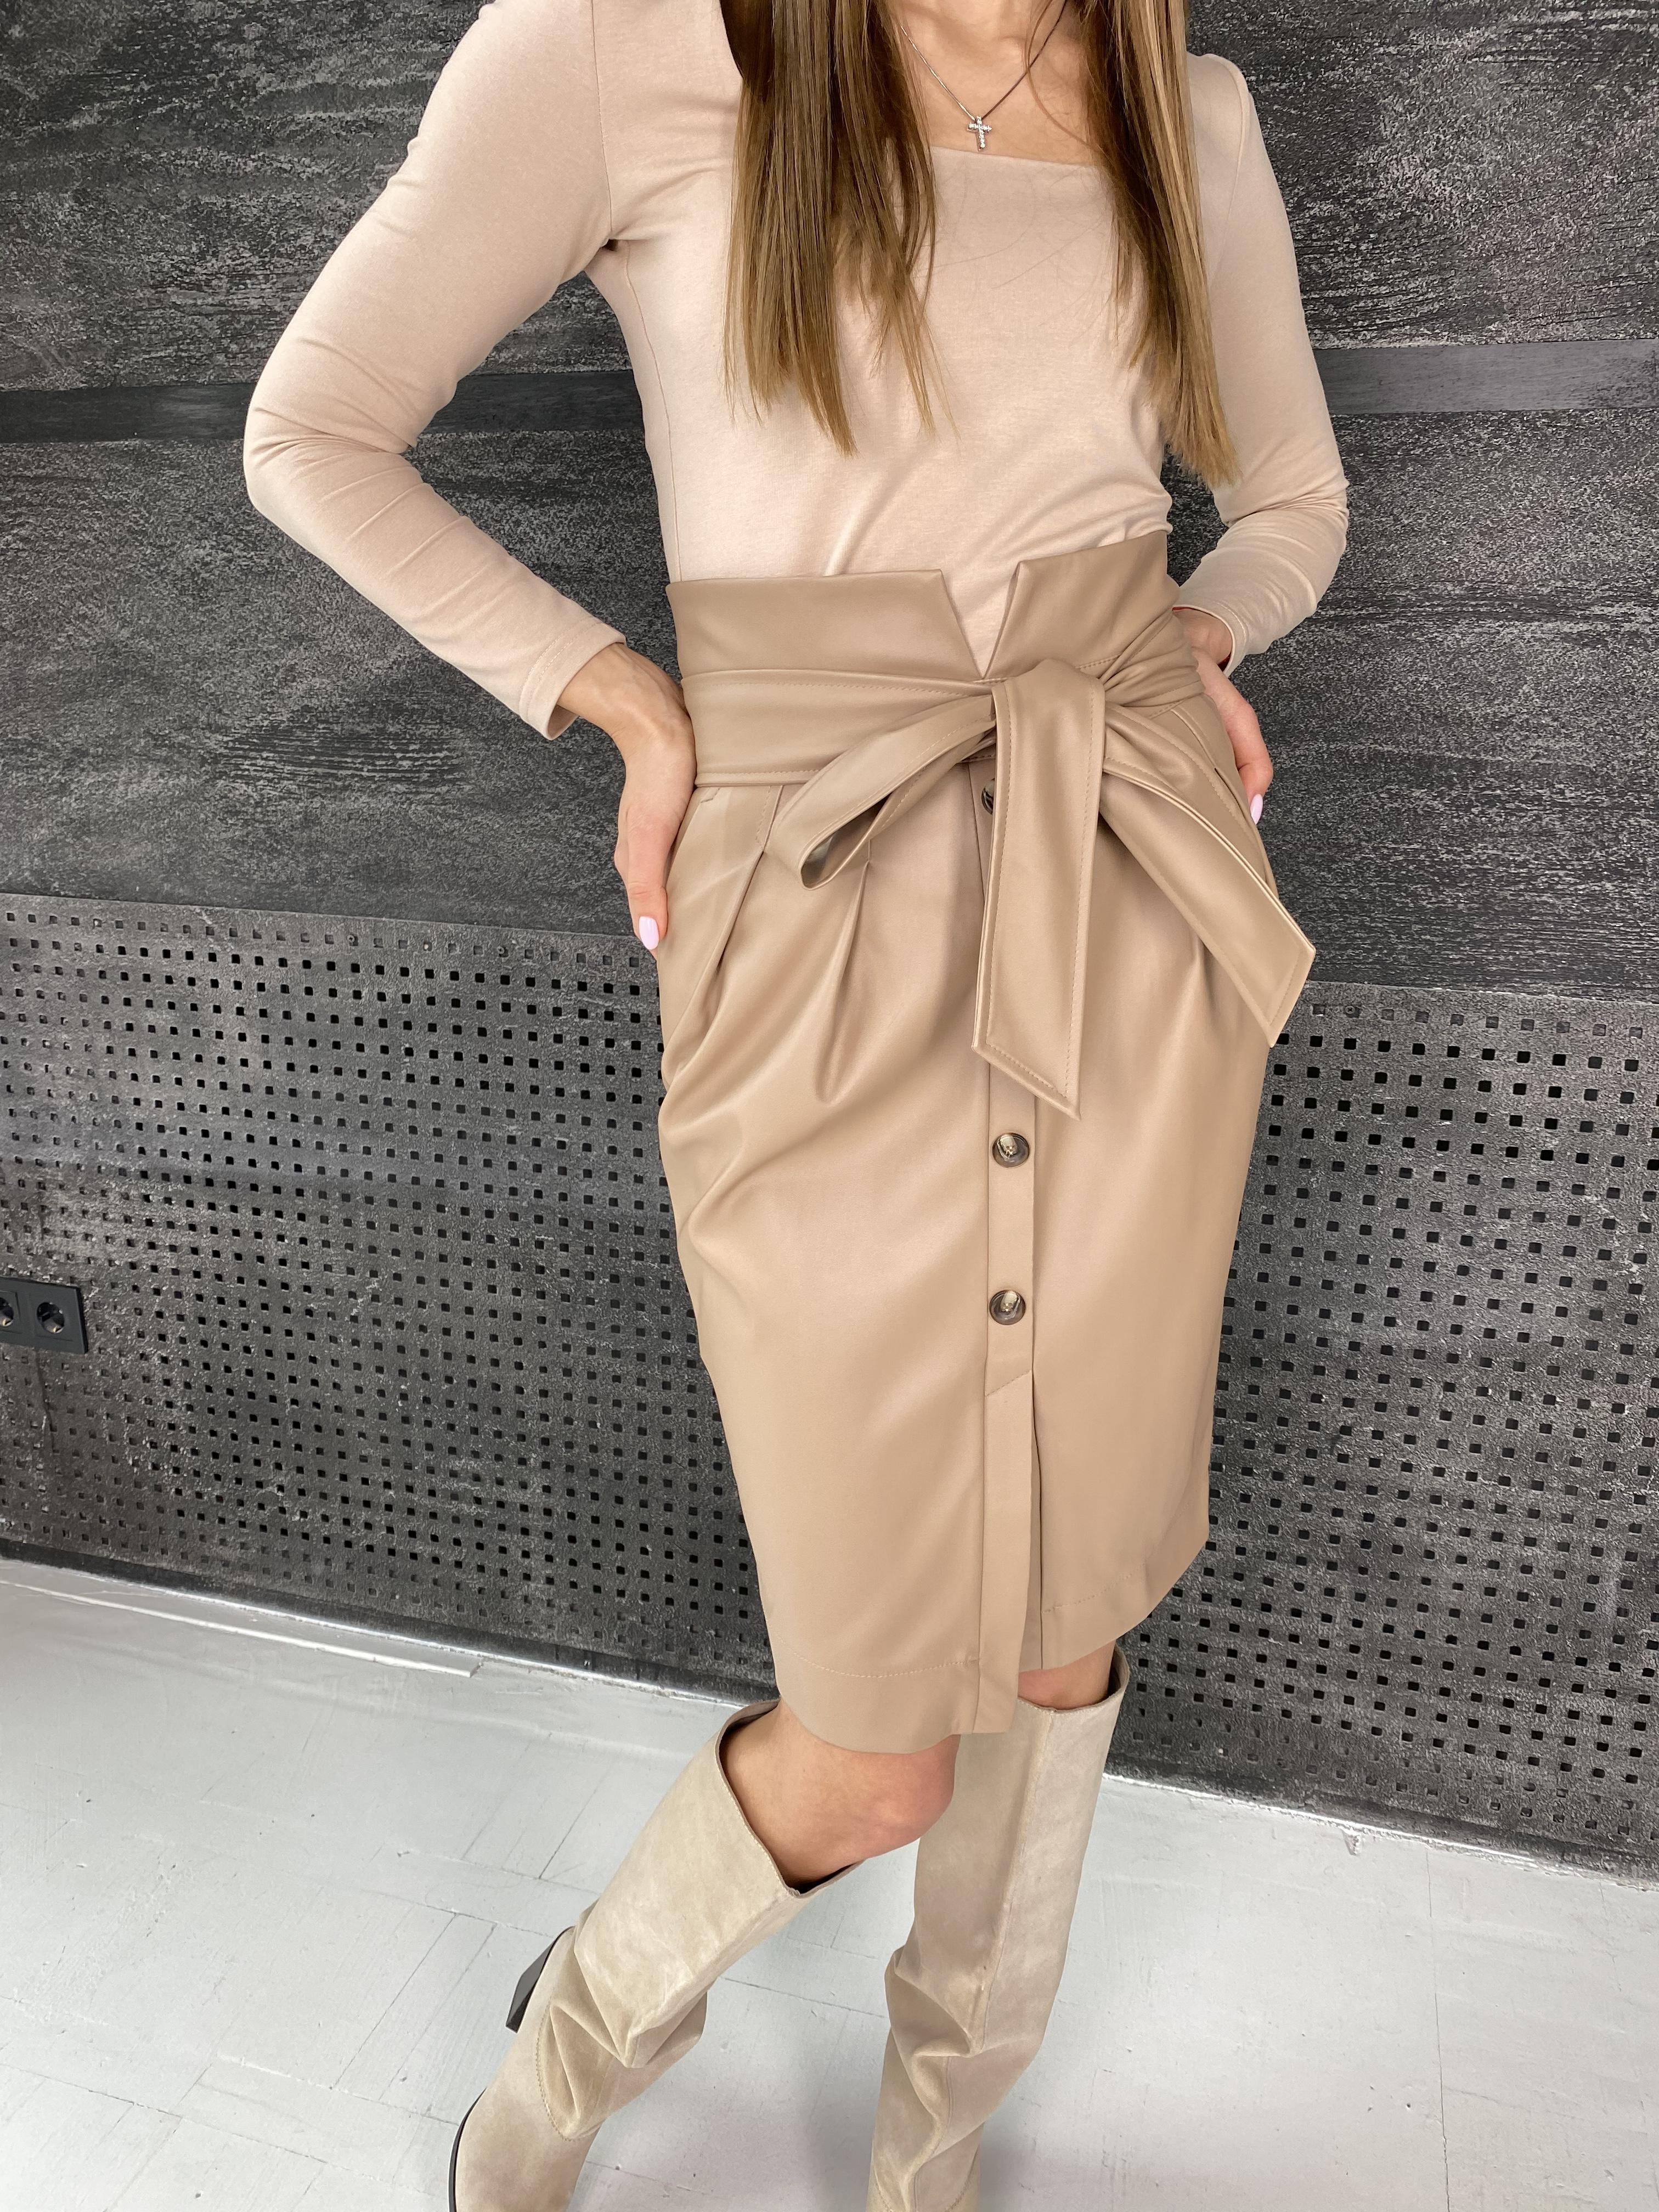 Марси юбка из экокожи 7913 АРТ. 46105 Цвет: Бежевый - фото 3, интернет магазин tm-modus.ru